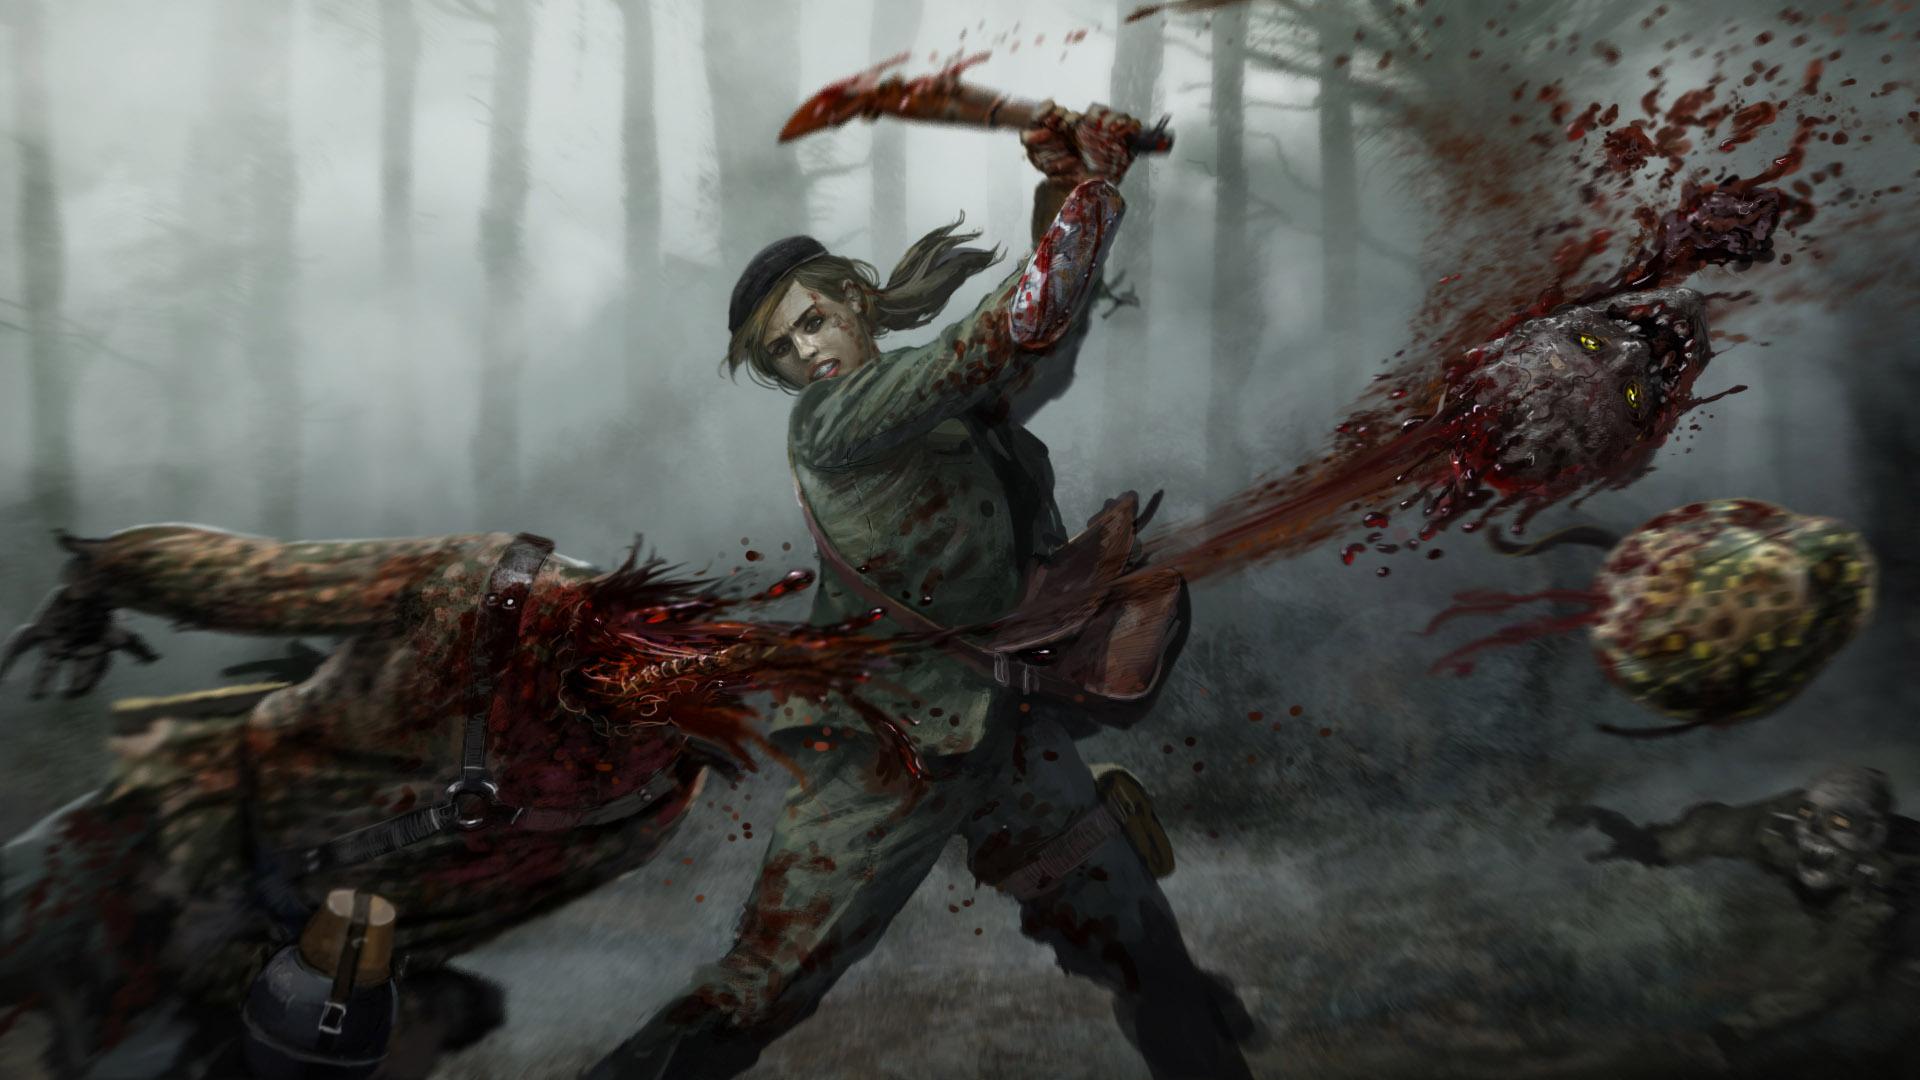 Zombie army trilogy matchmaking